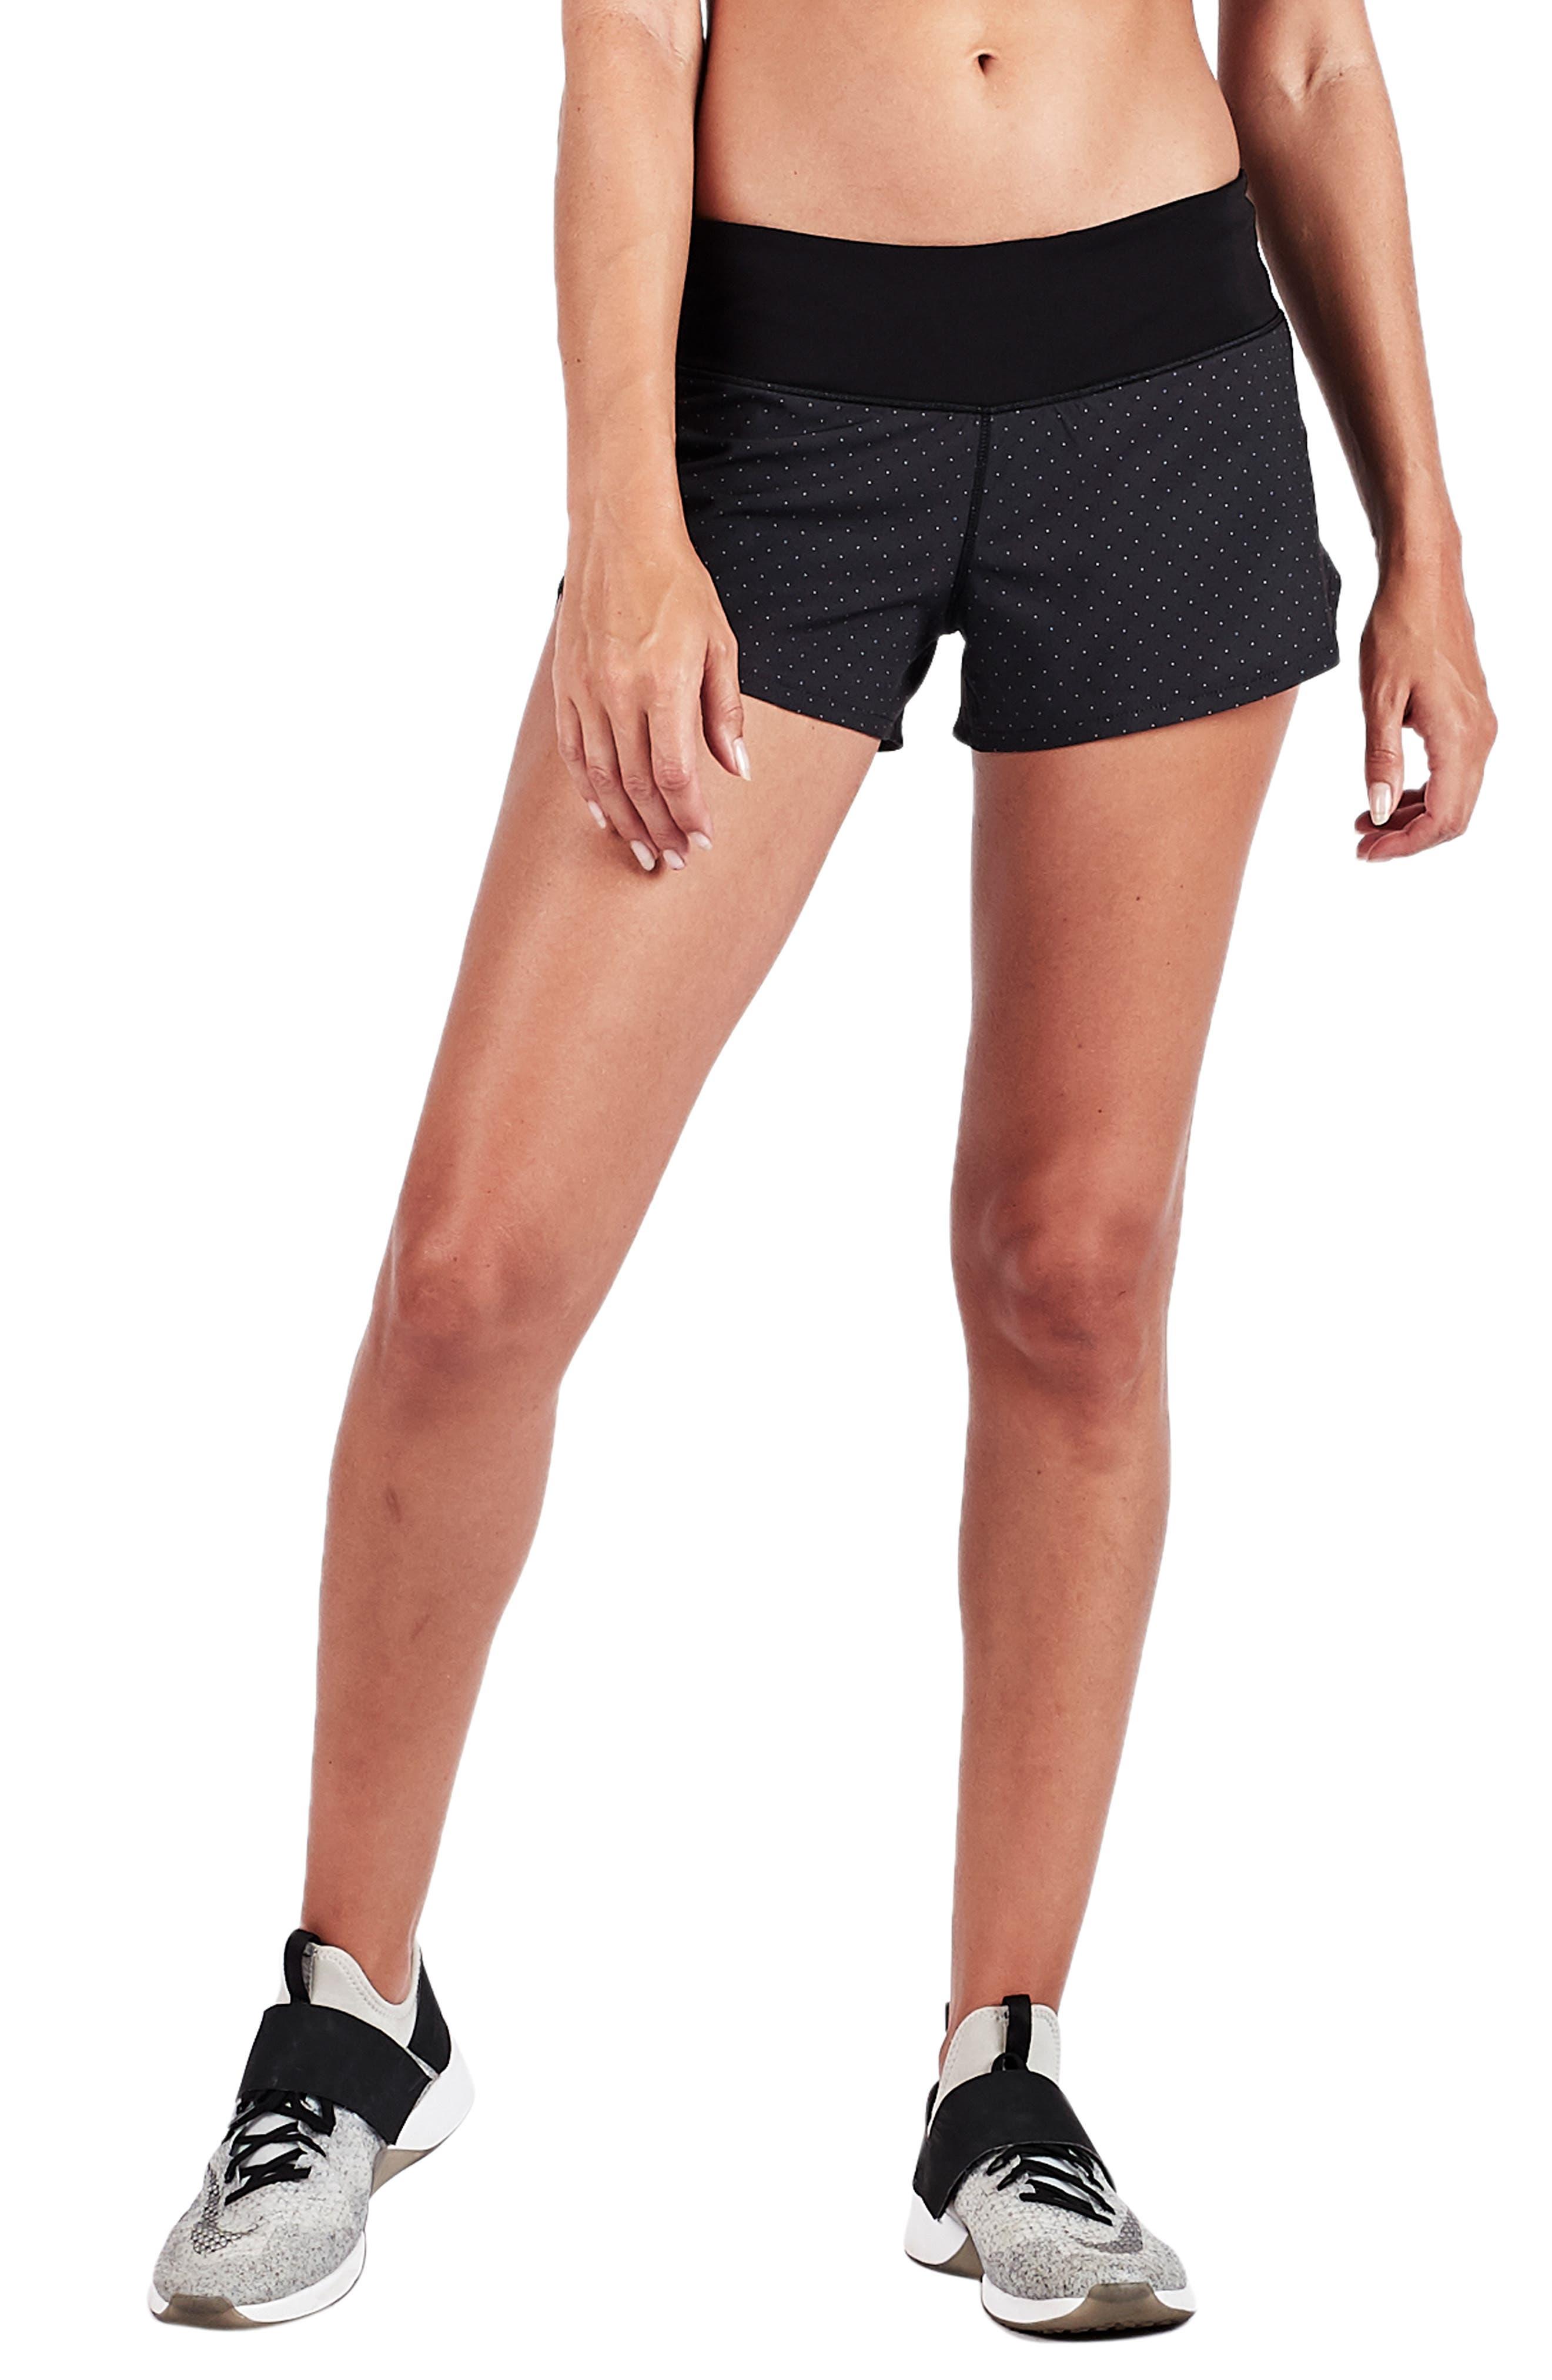 Vuori Omni Performance Shorts, Black